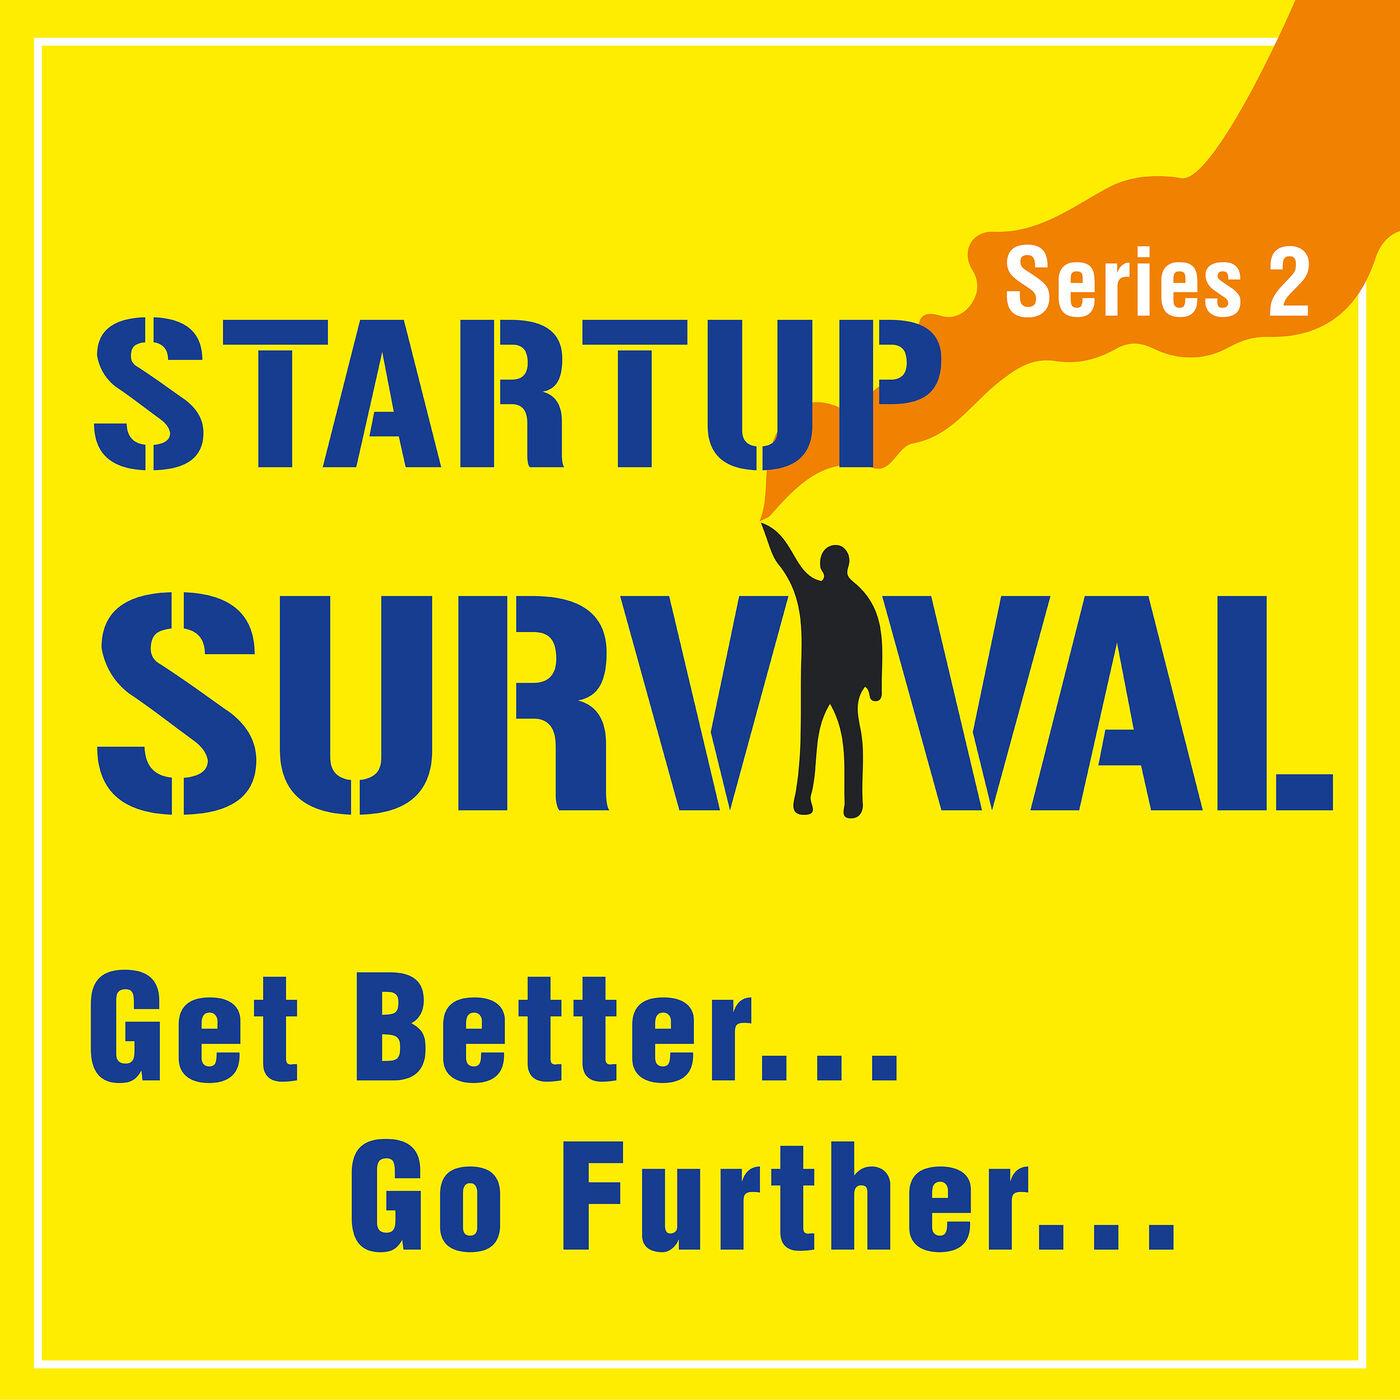 Episode 7 - How to Start and Grow a Social Enterprise